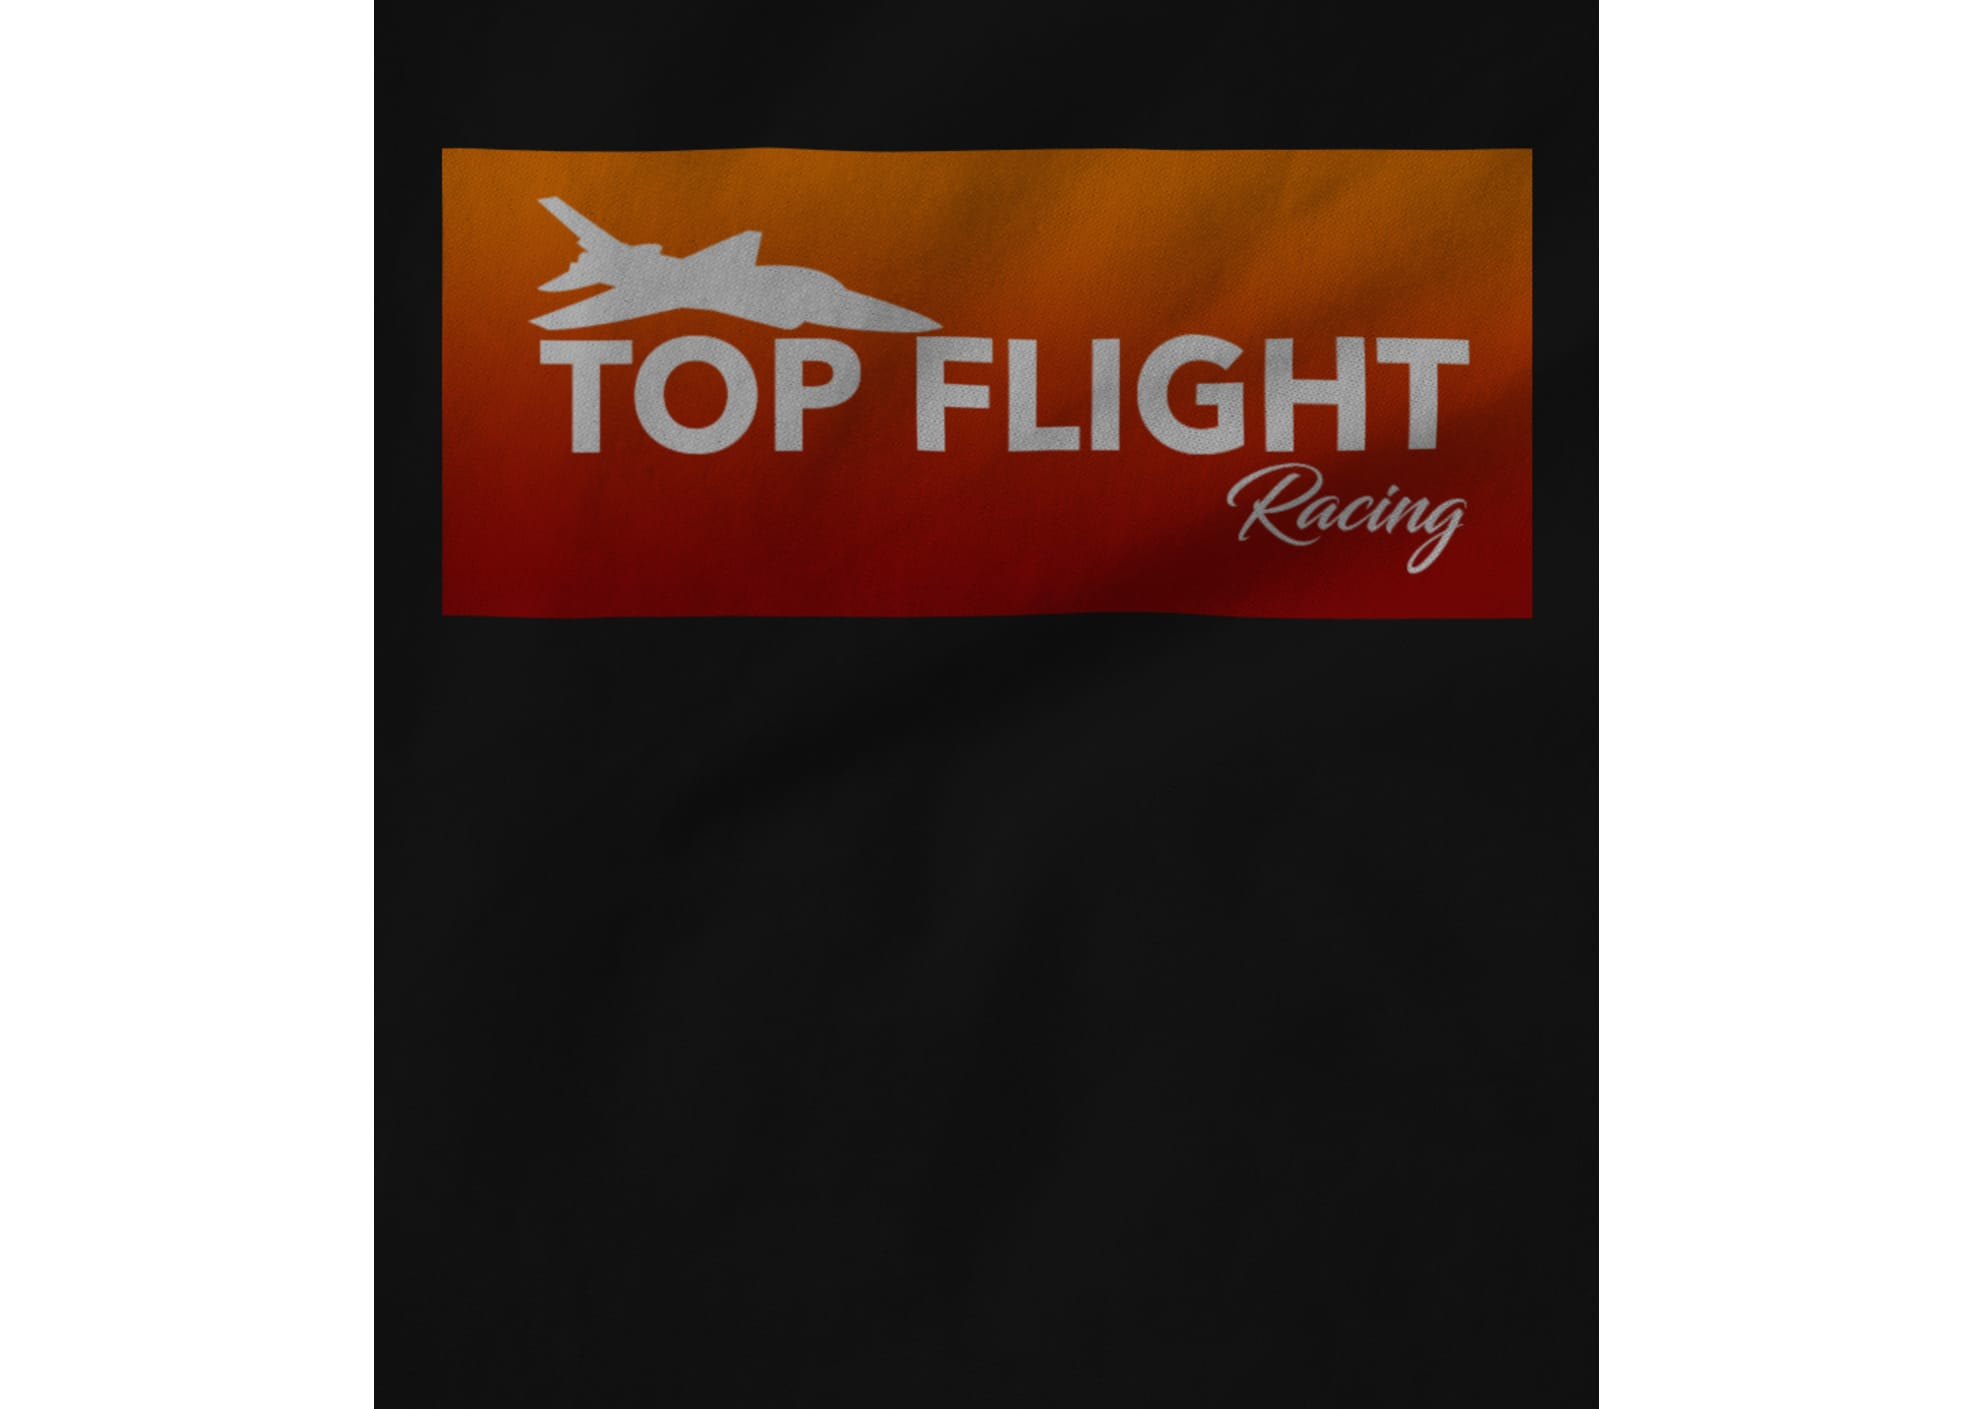 Serbie topflight1 1592797113